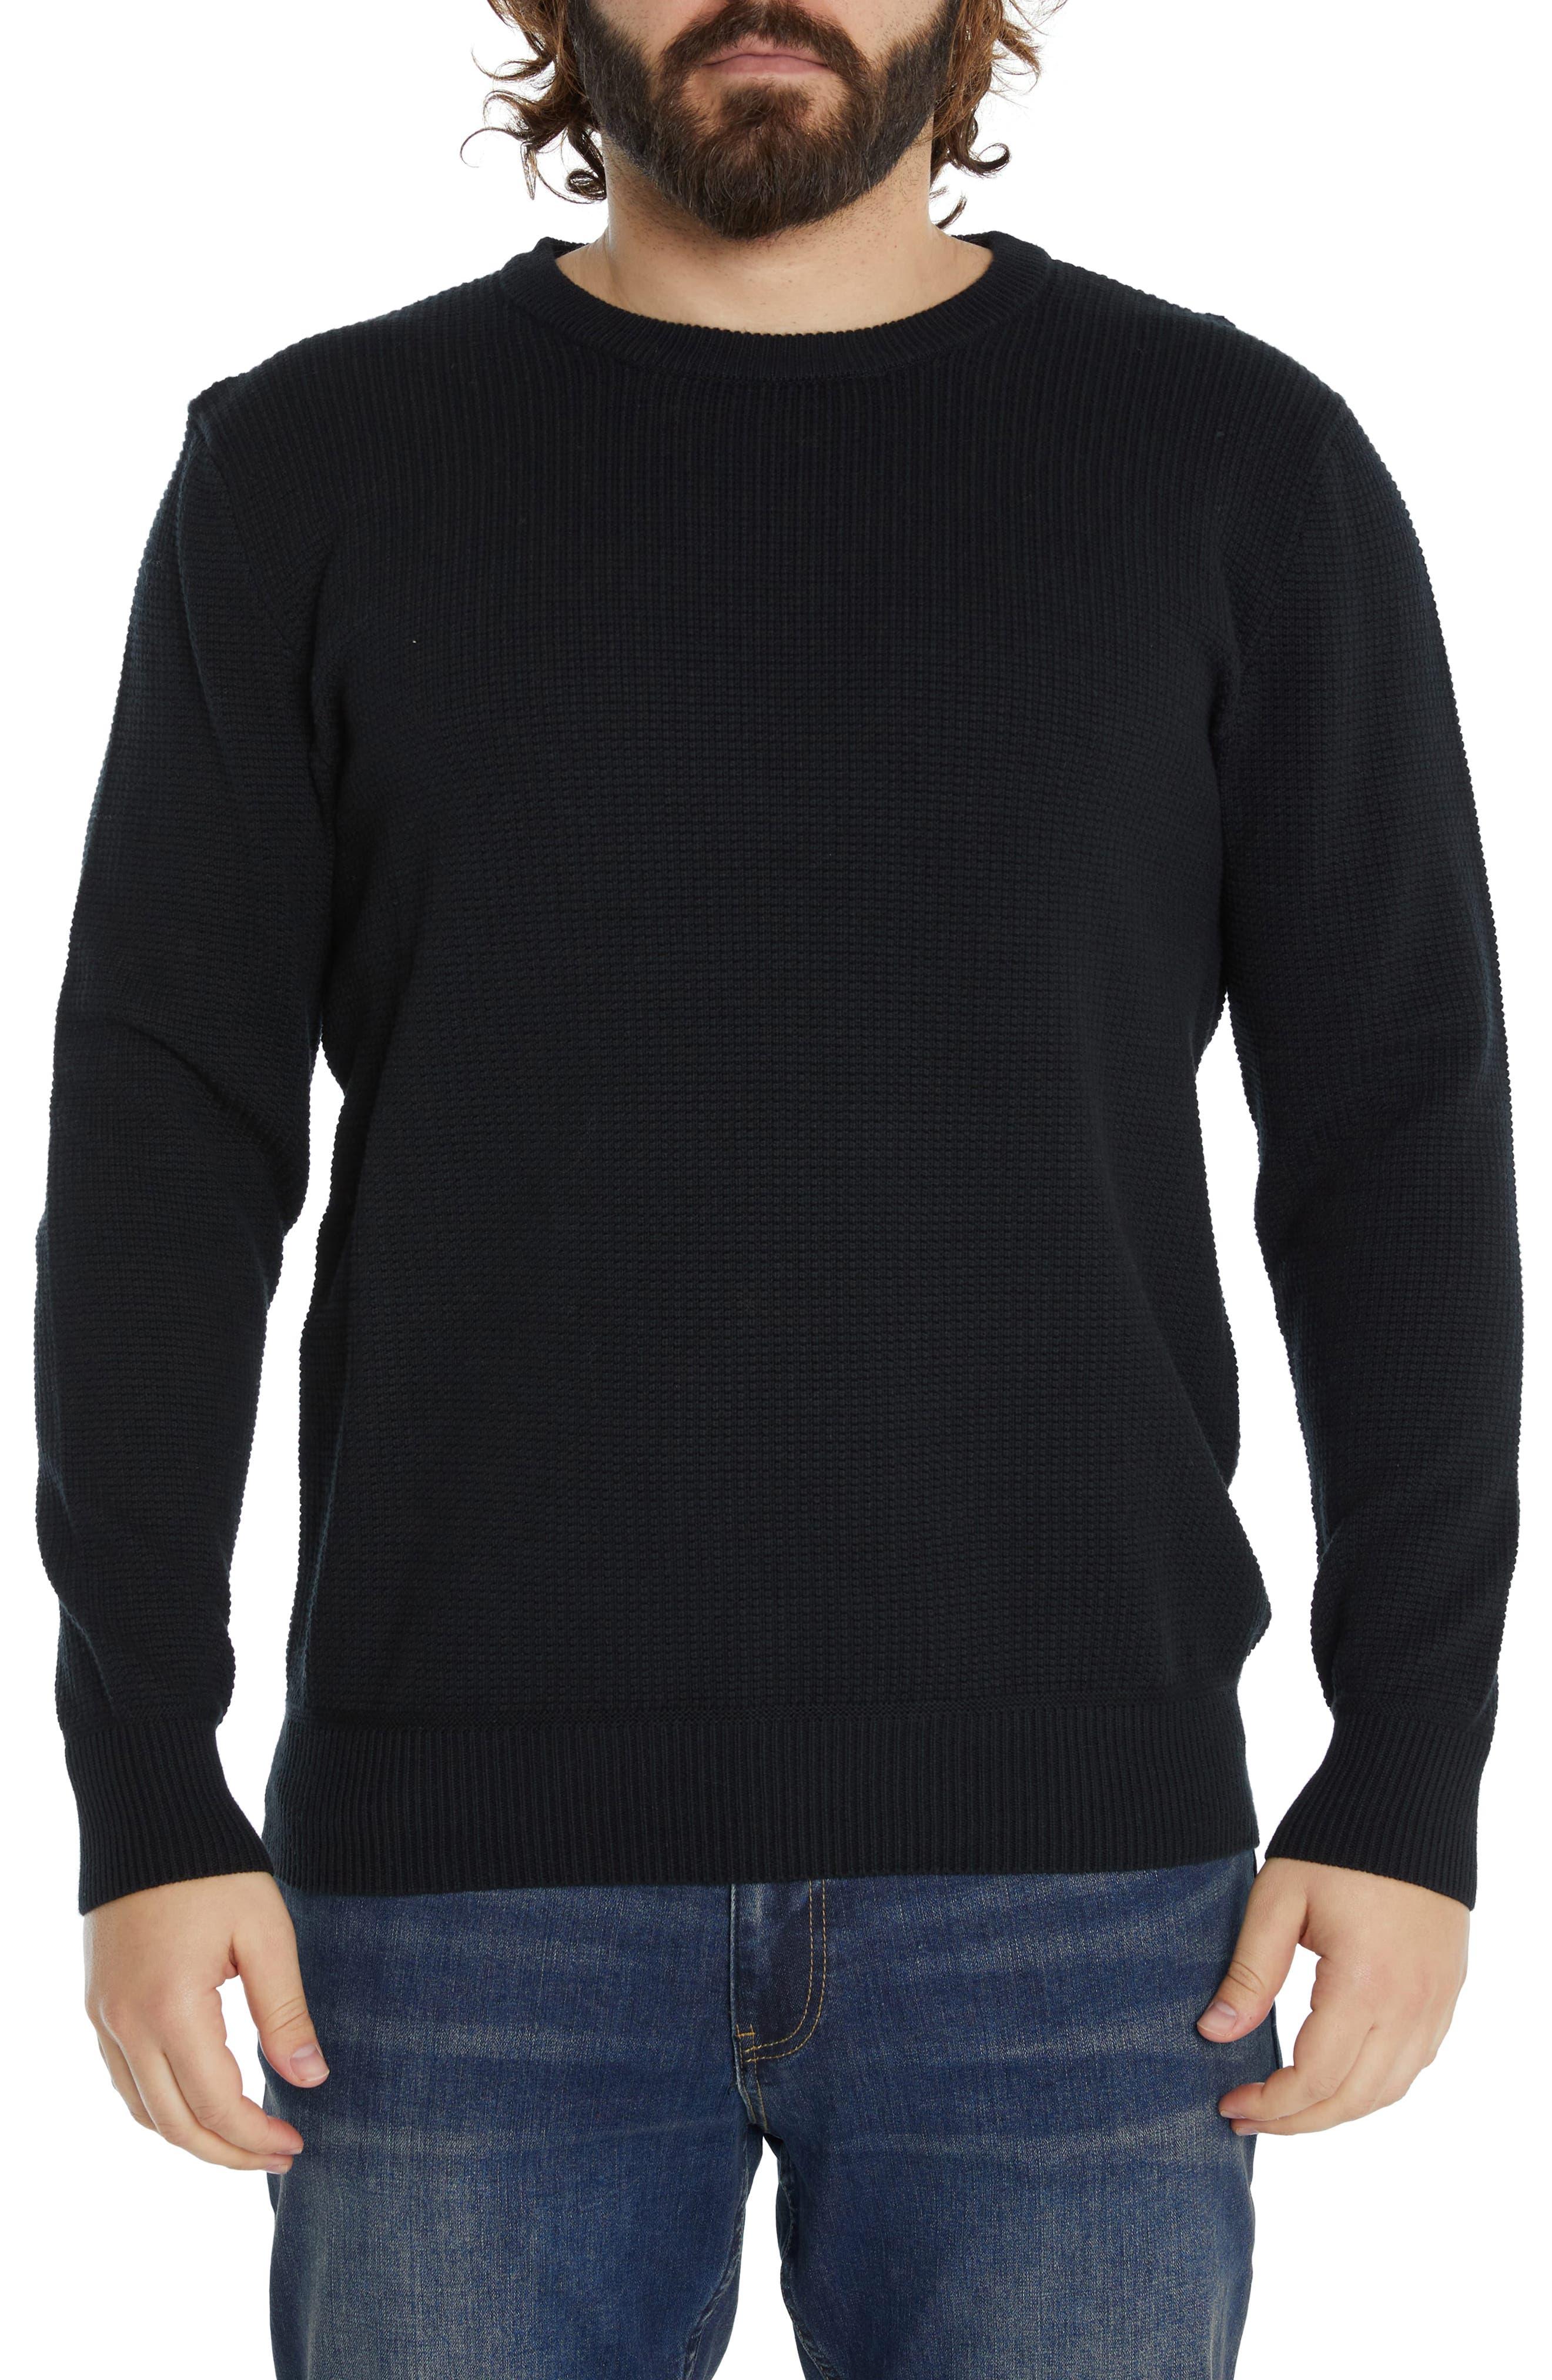 Palmer Ribbed Cotton Crewneck Sweater